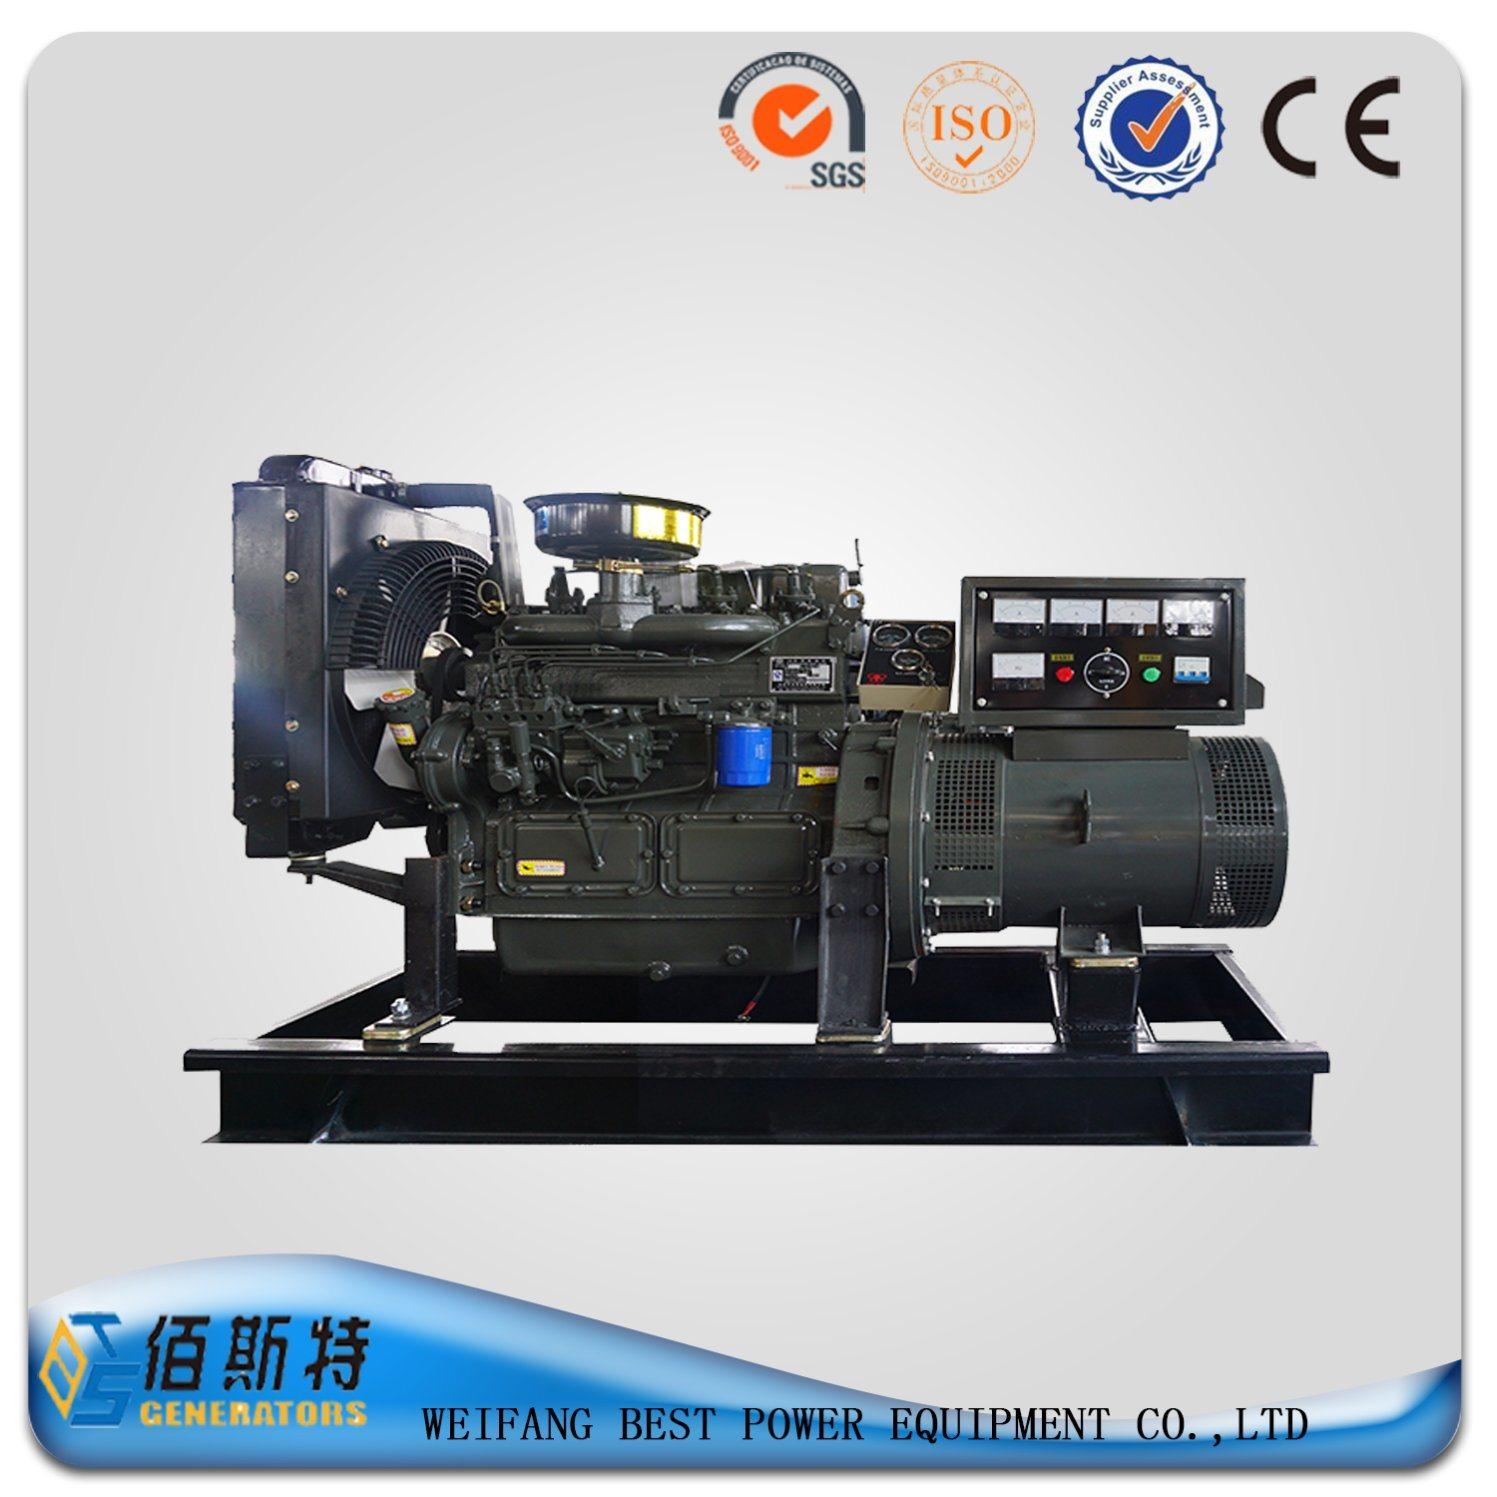 China 50kw Diesel Generator Set Electric Power Genset R6105zd